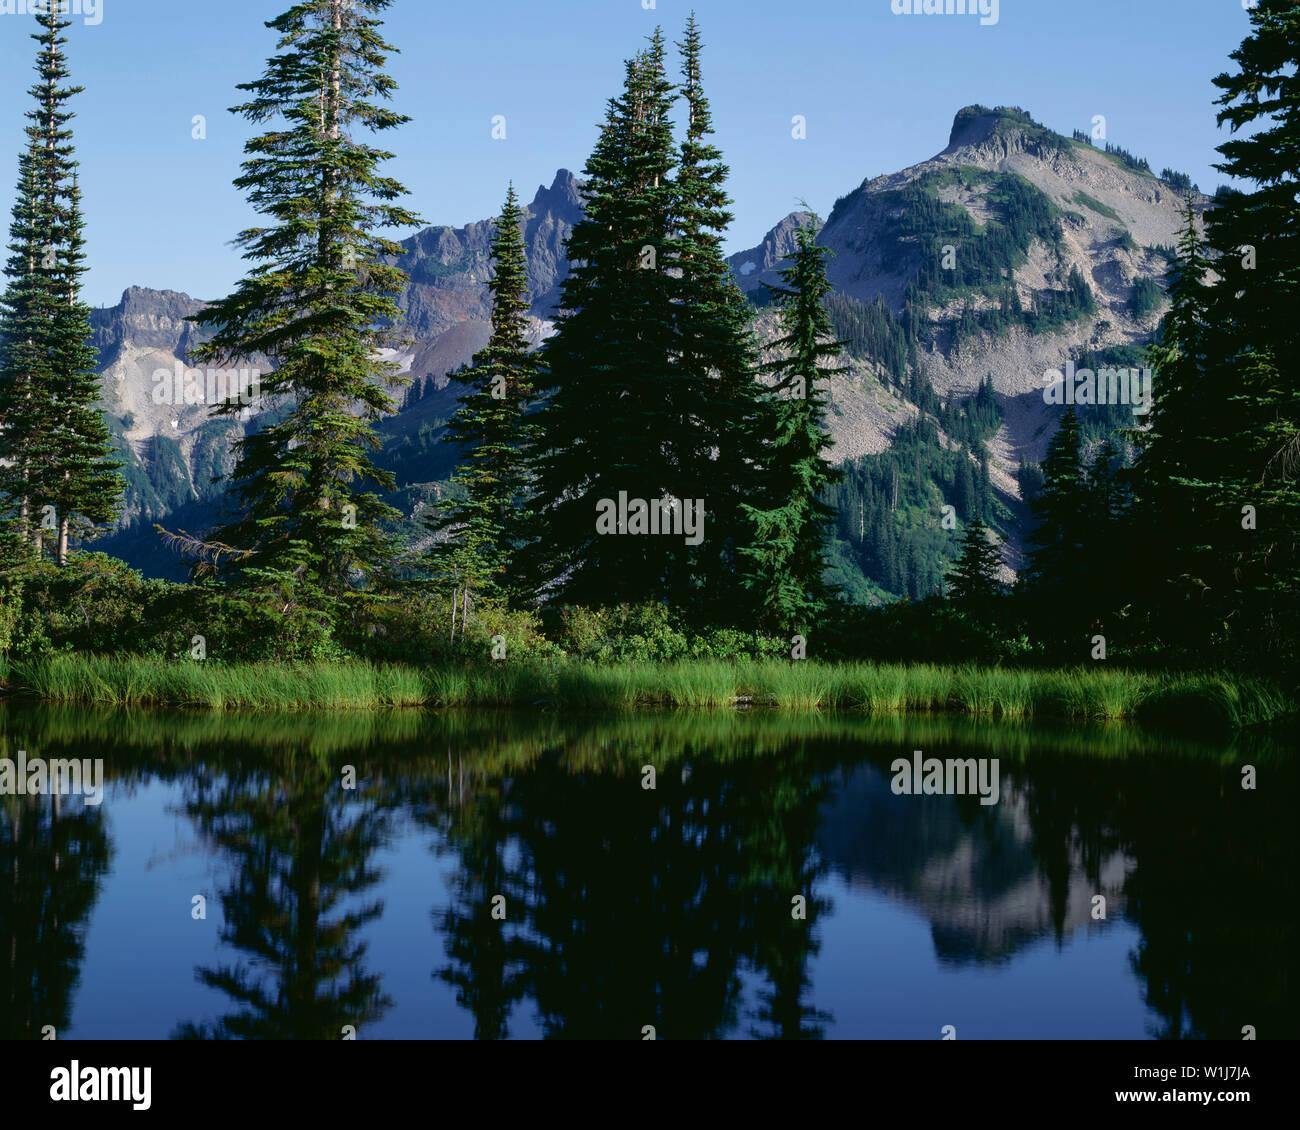 USA, Washington, Mt. Rainier National Park, Unicorn Peak and the Tatoosh Range are reflected in a small pond. - Stock Image